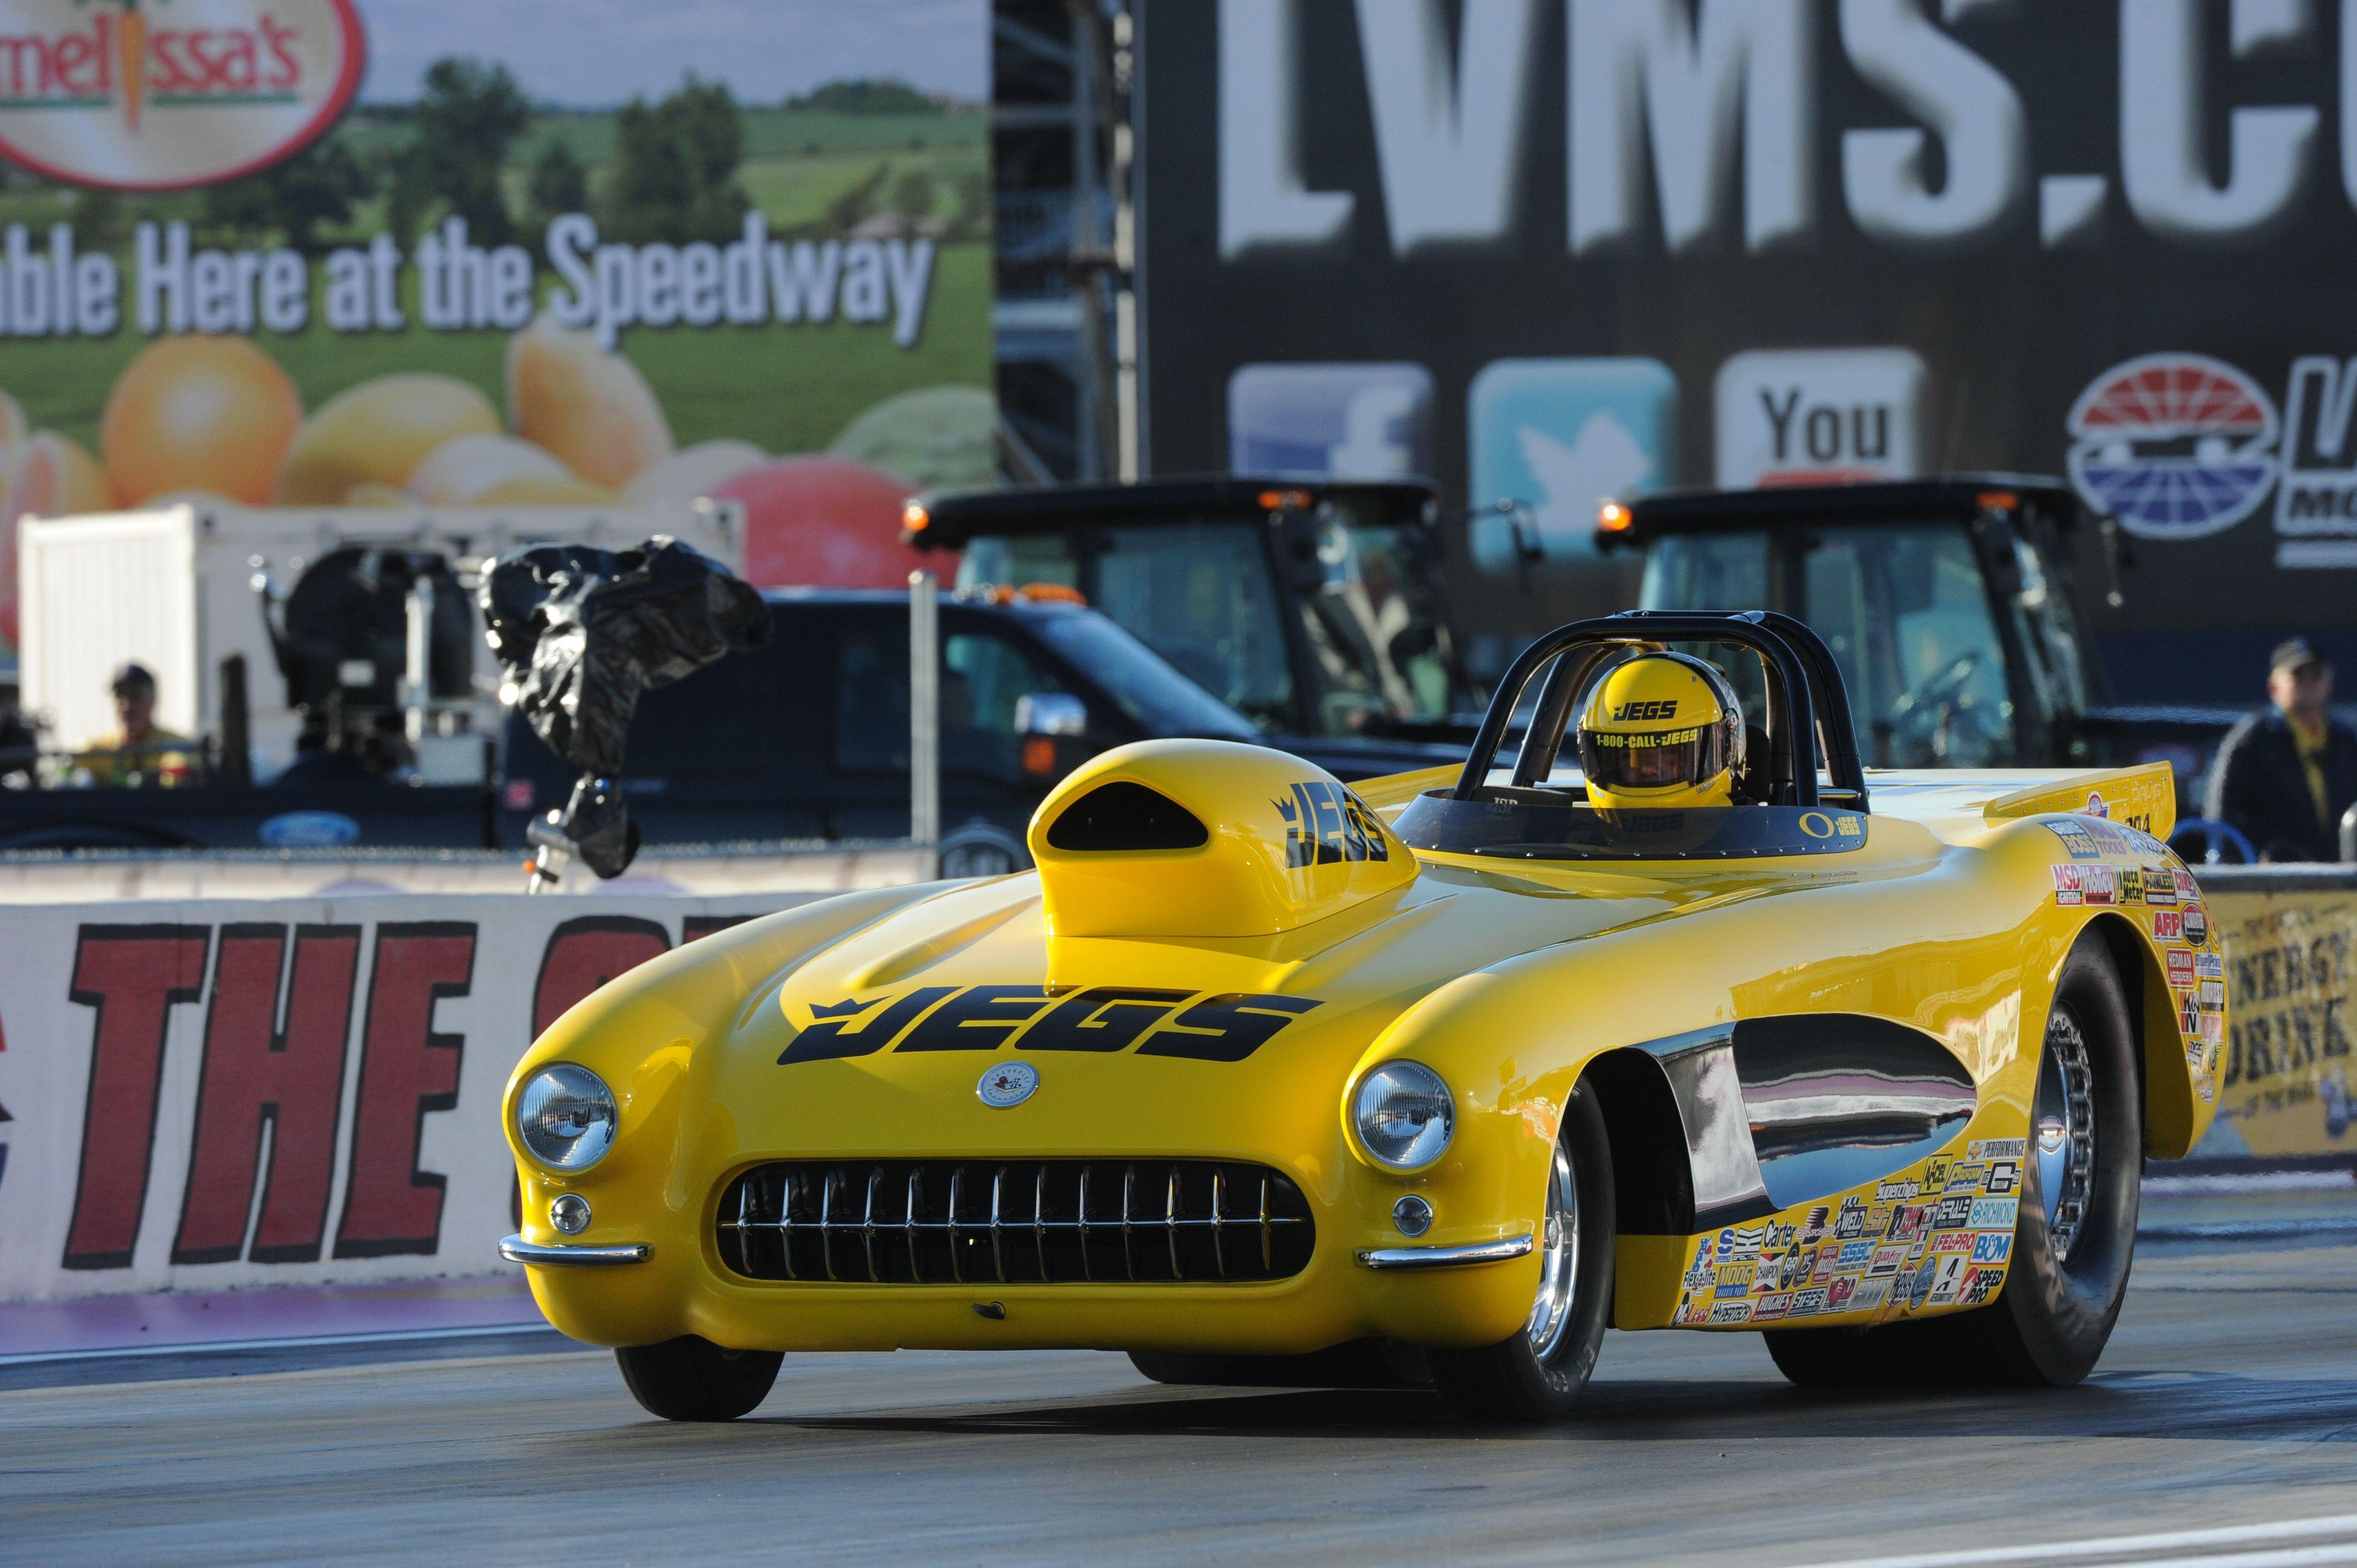 2012 Nhra Big O Tires Nationals Troy Coughlin Jr Super Gas Corvette Las Vegas Nv Corvette Corvette America Cars Usa